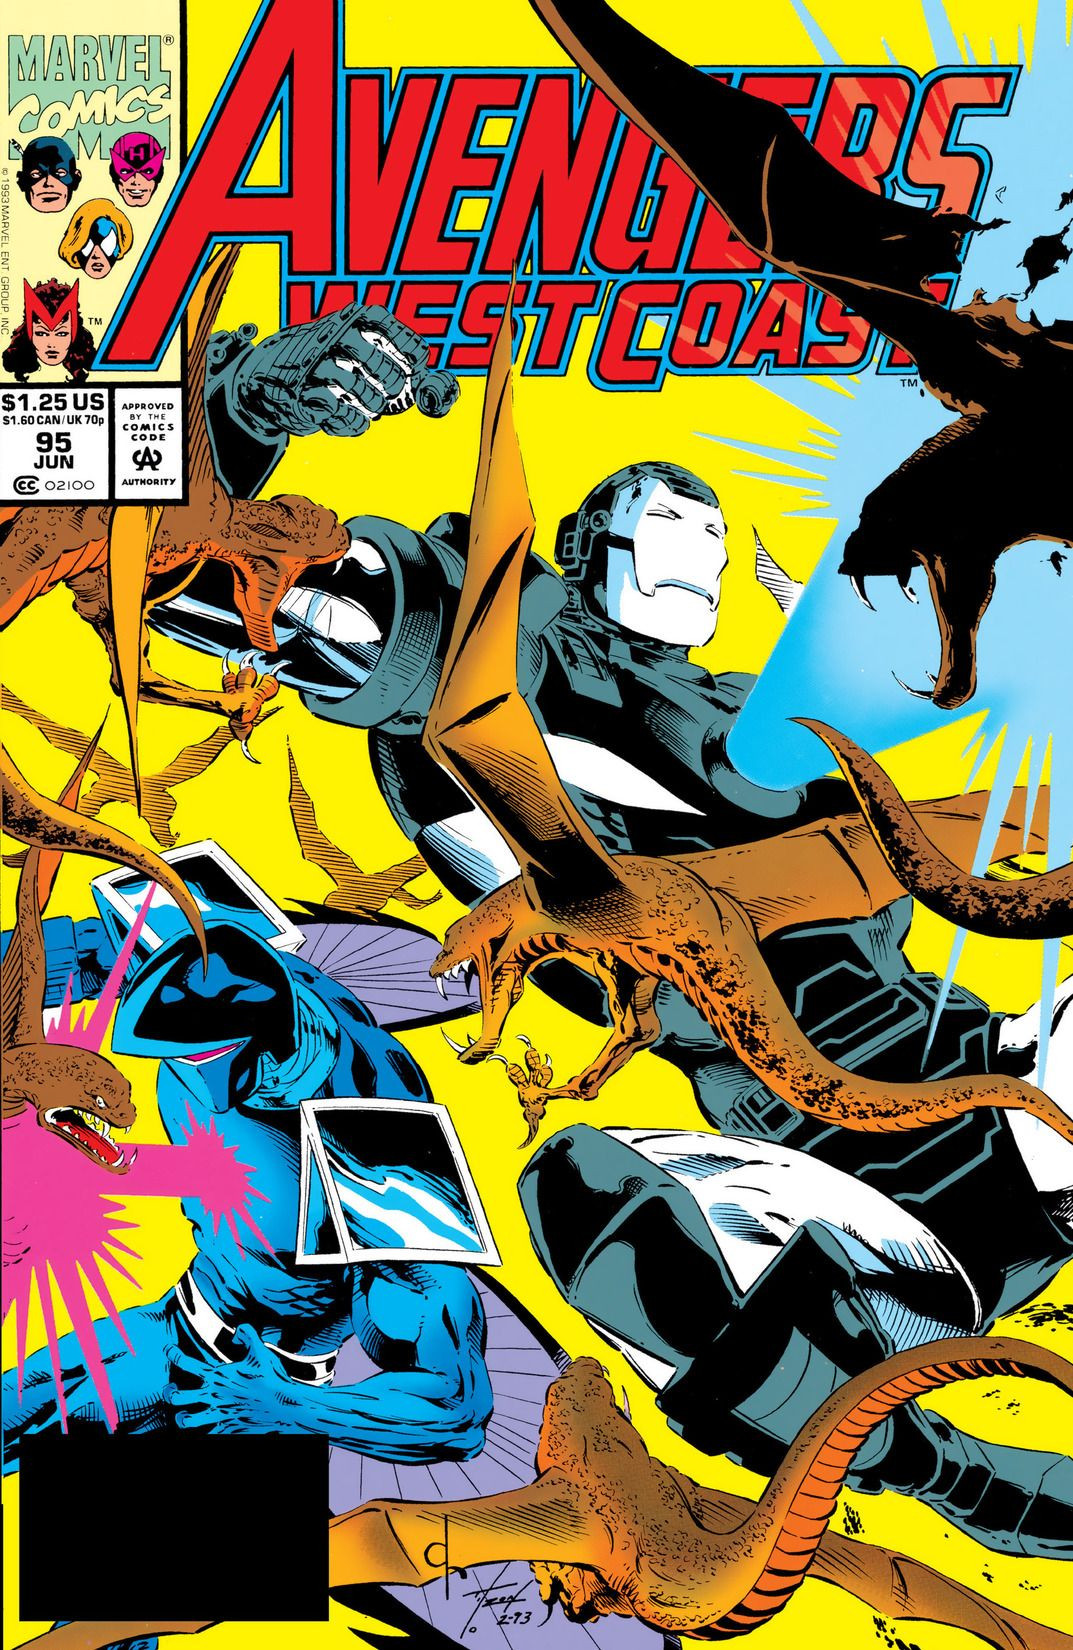 Avengers West Coast Vol 2 95